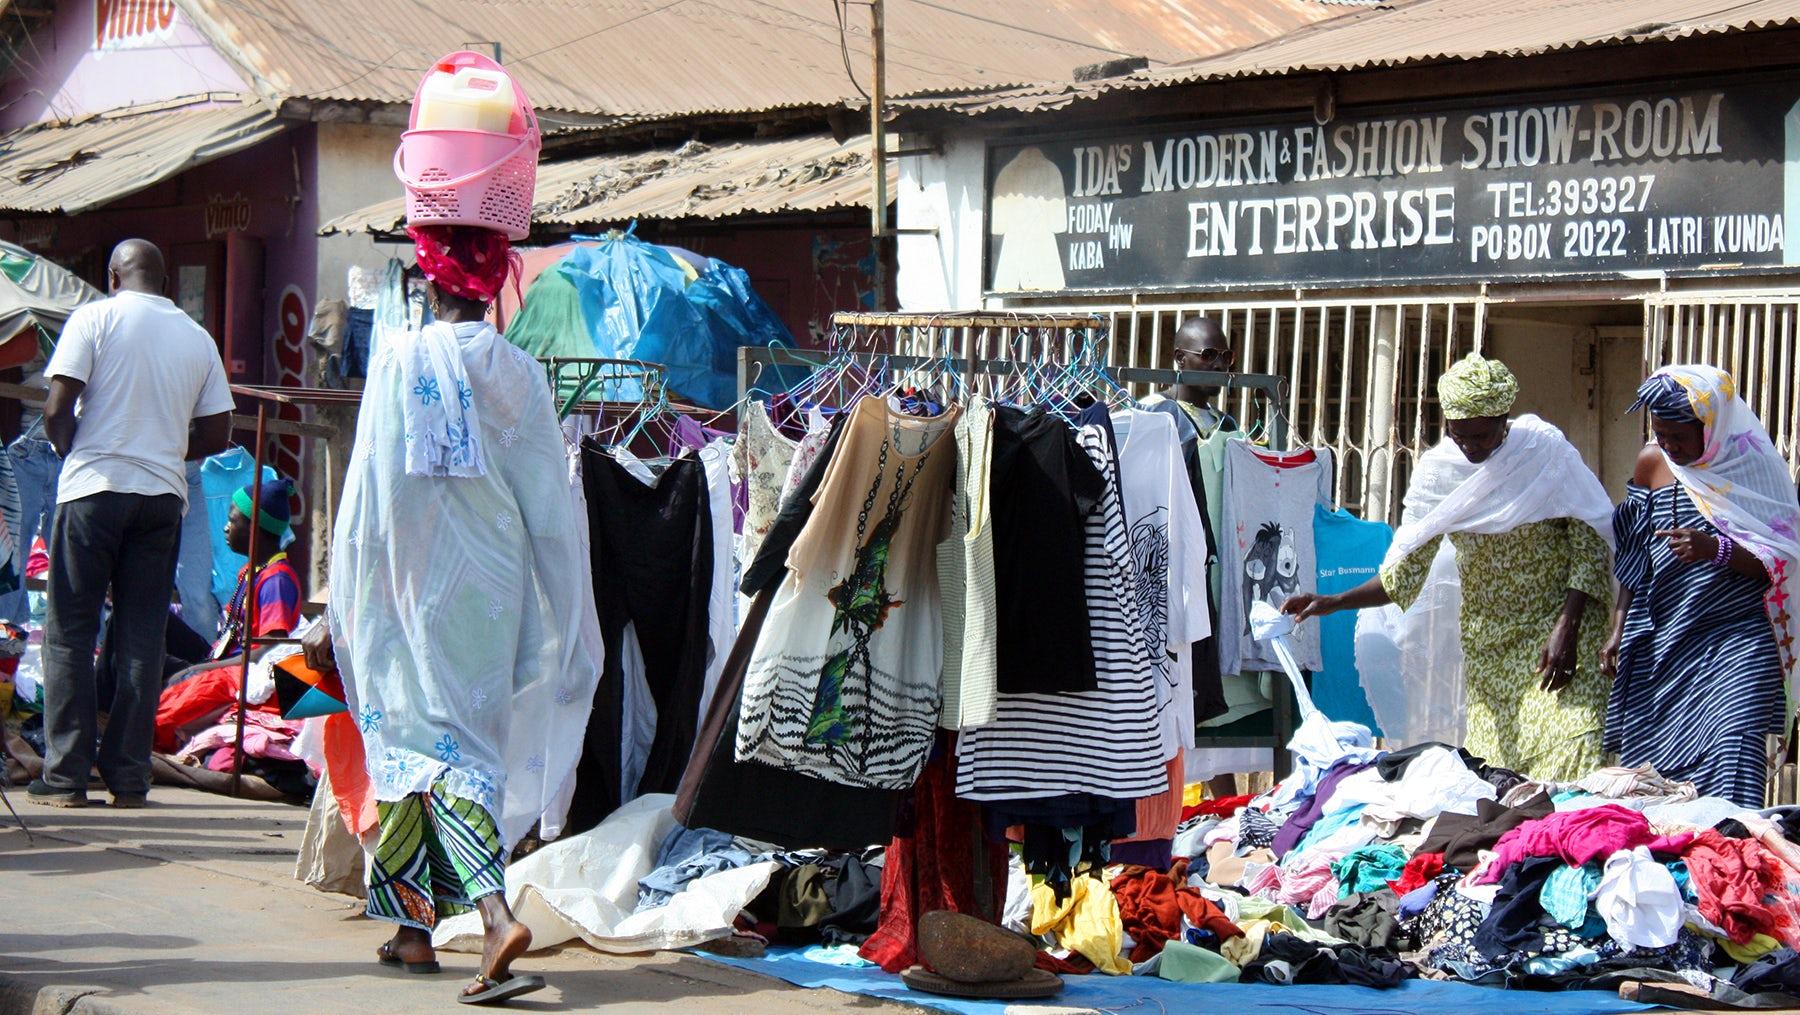 Shops at the Serrekunda market in Gambia, West Africa   Source: Shutterstock